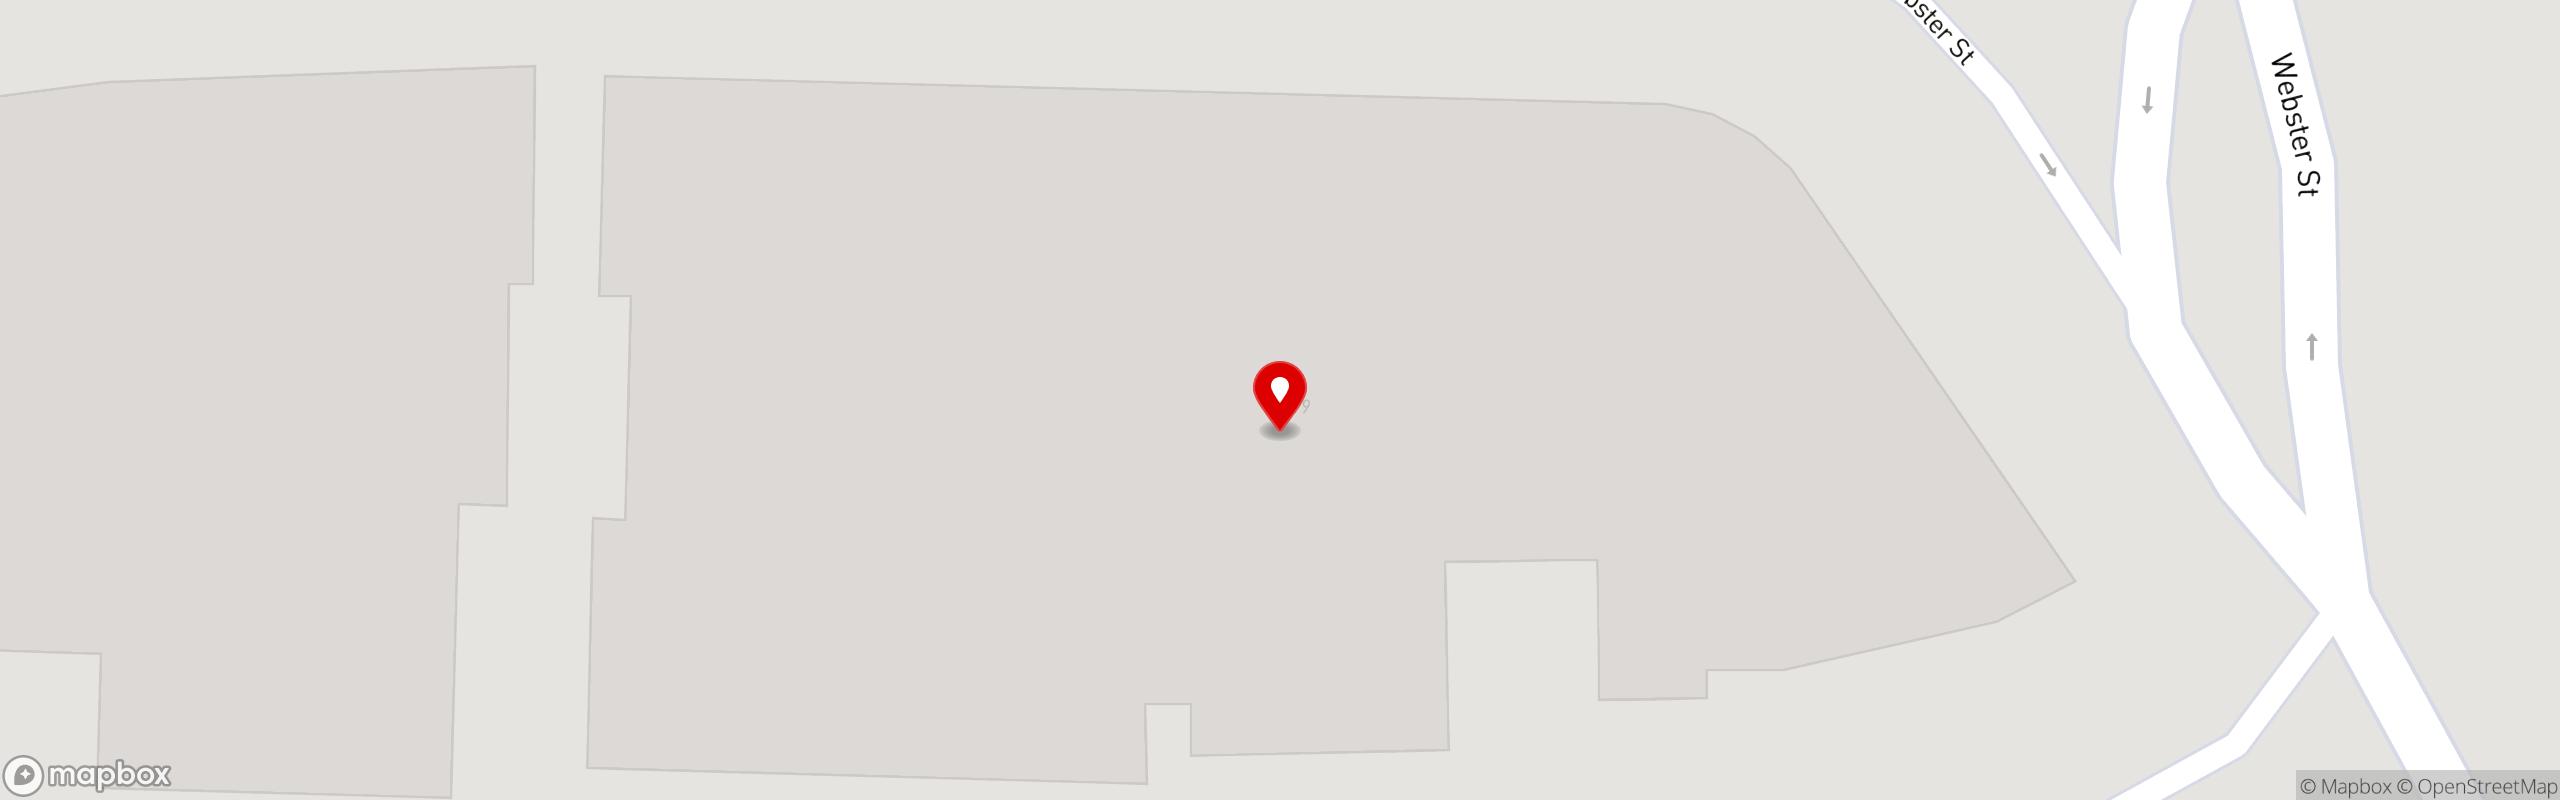 Map of restaurant locations